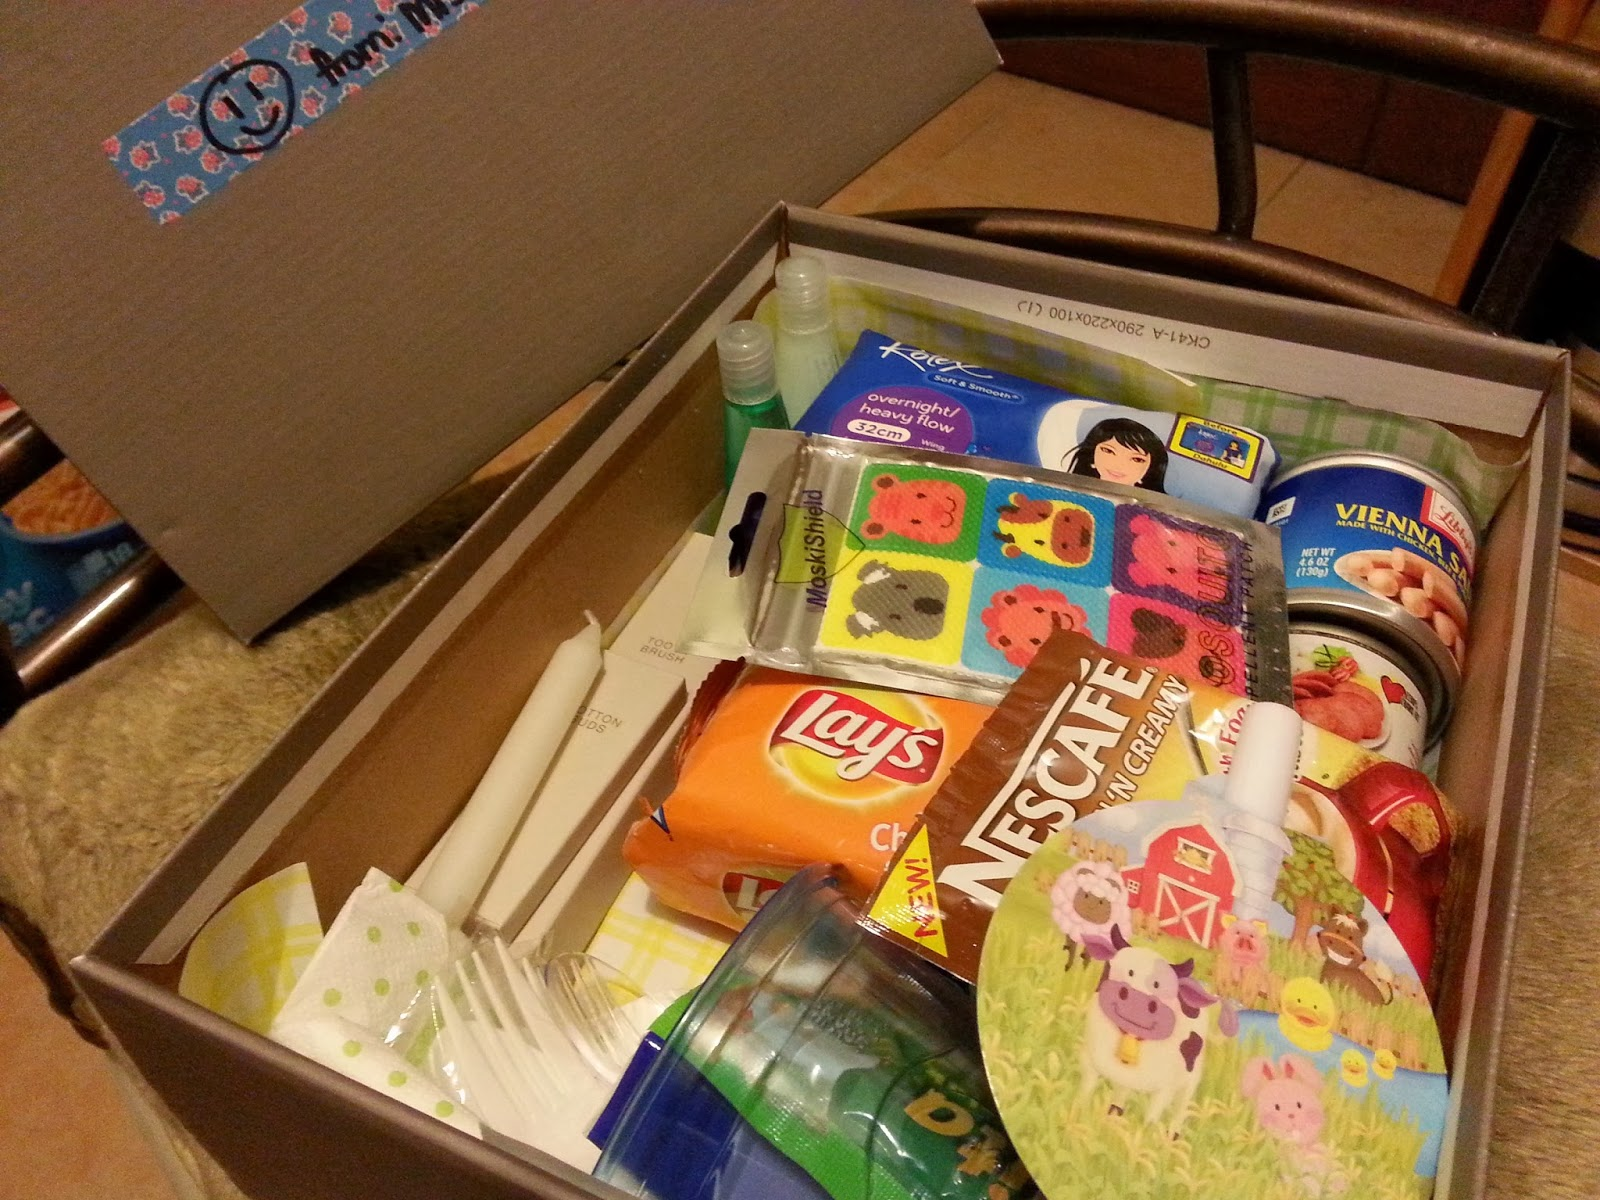 Food christmas gift ideas philippines typhoon